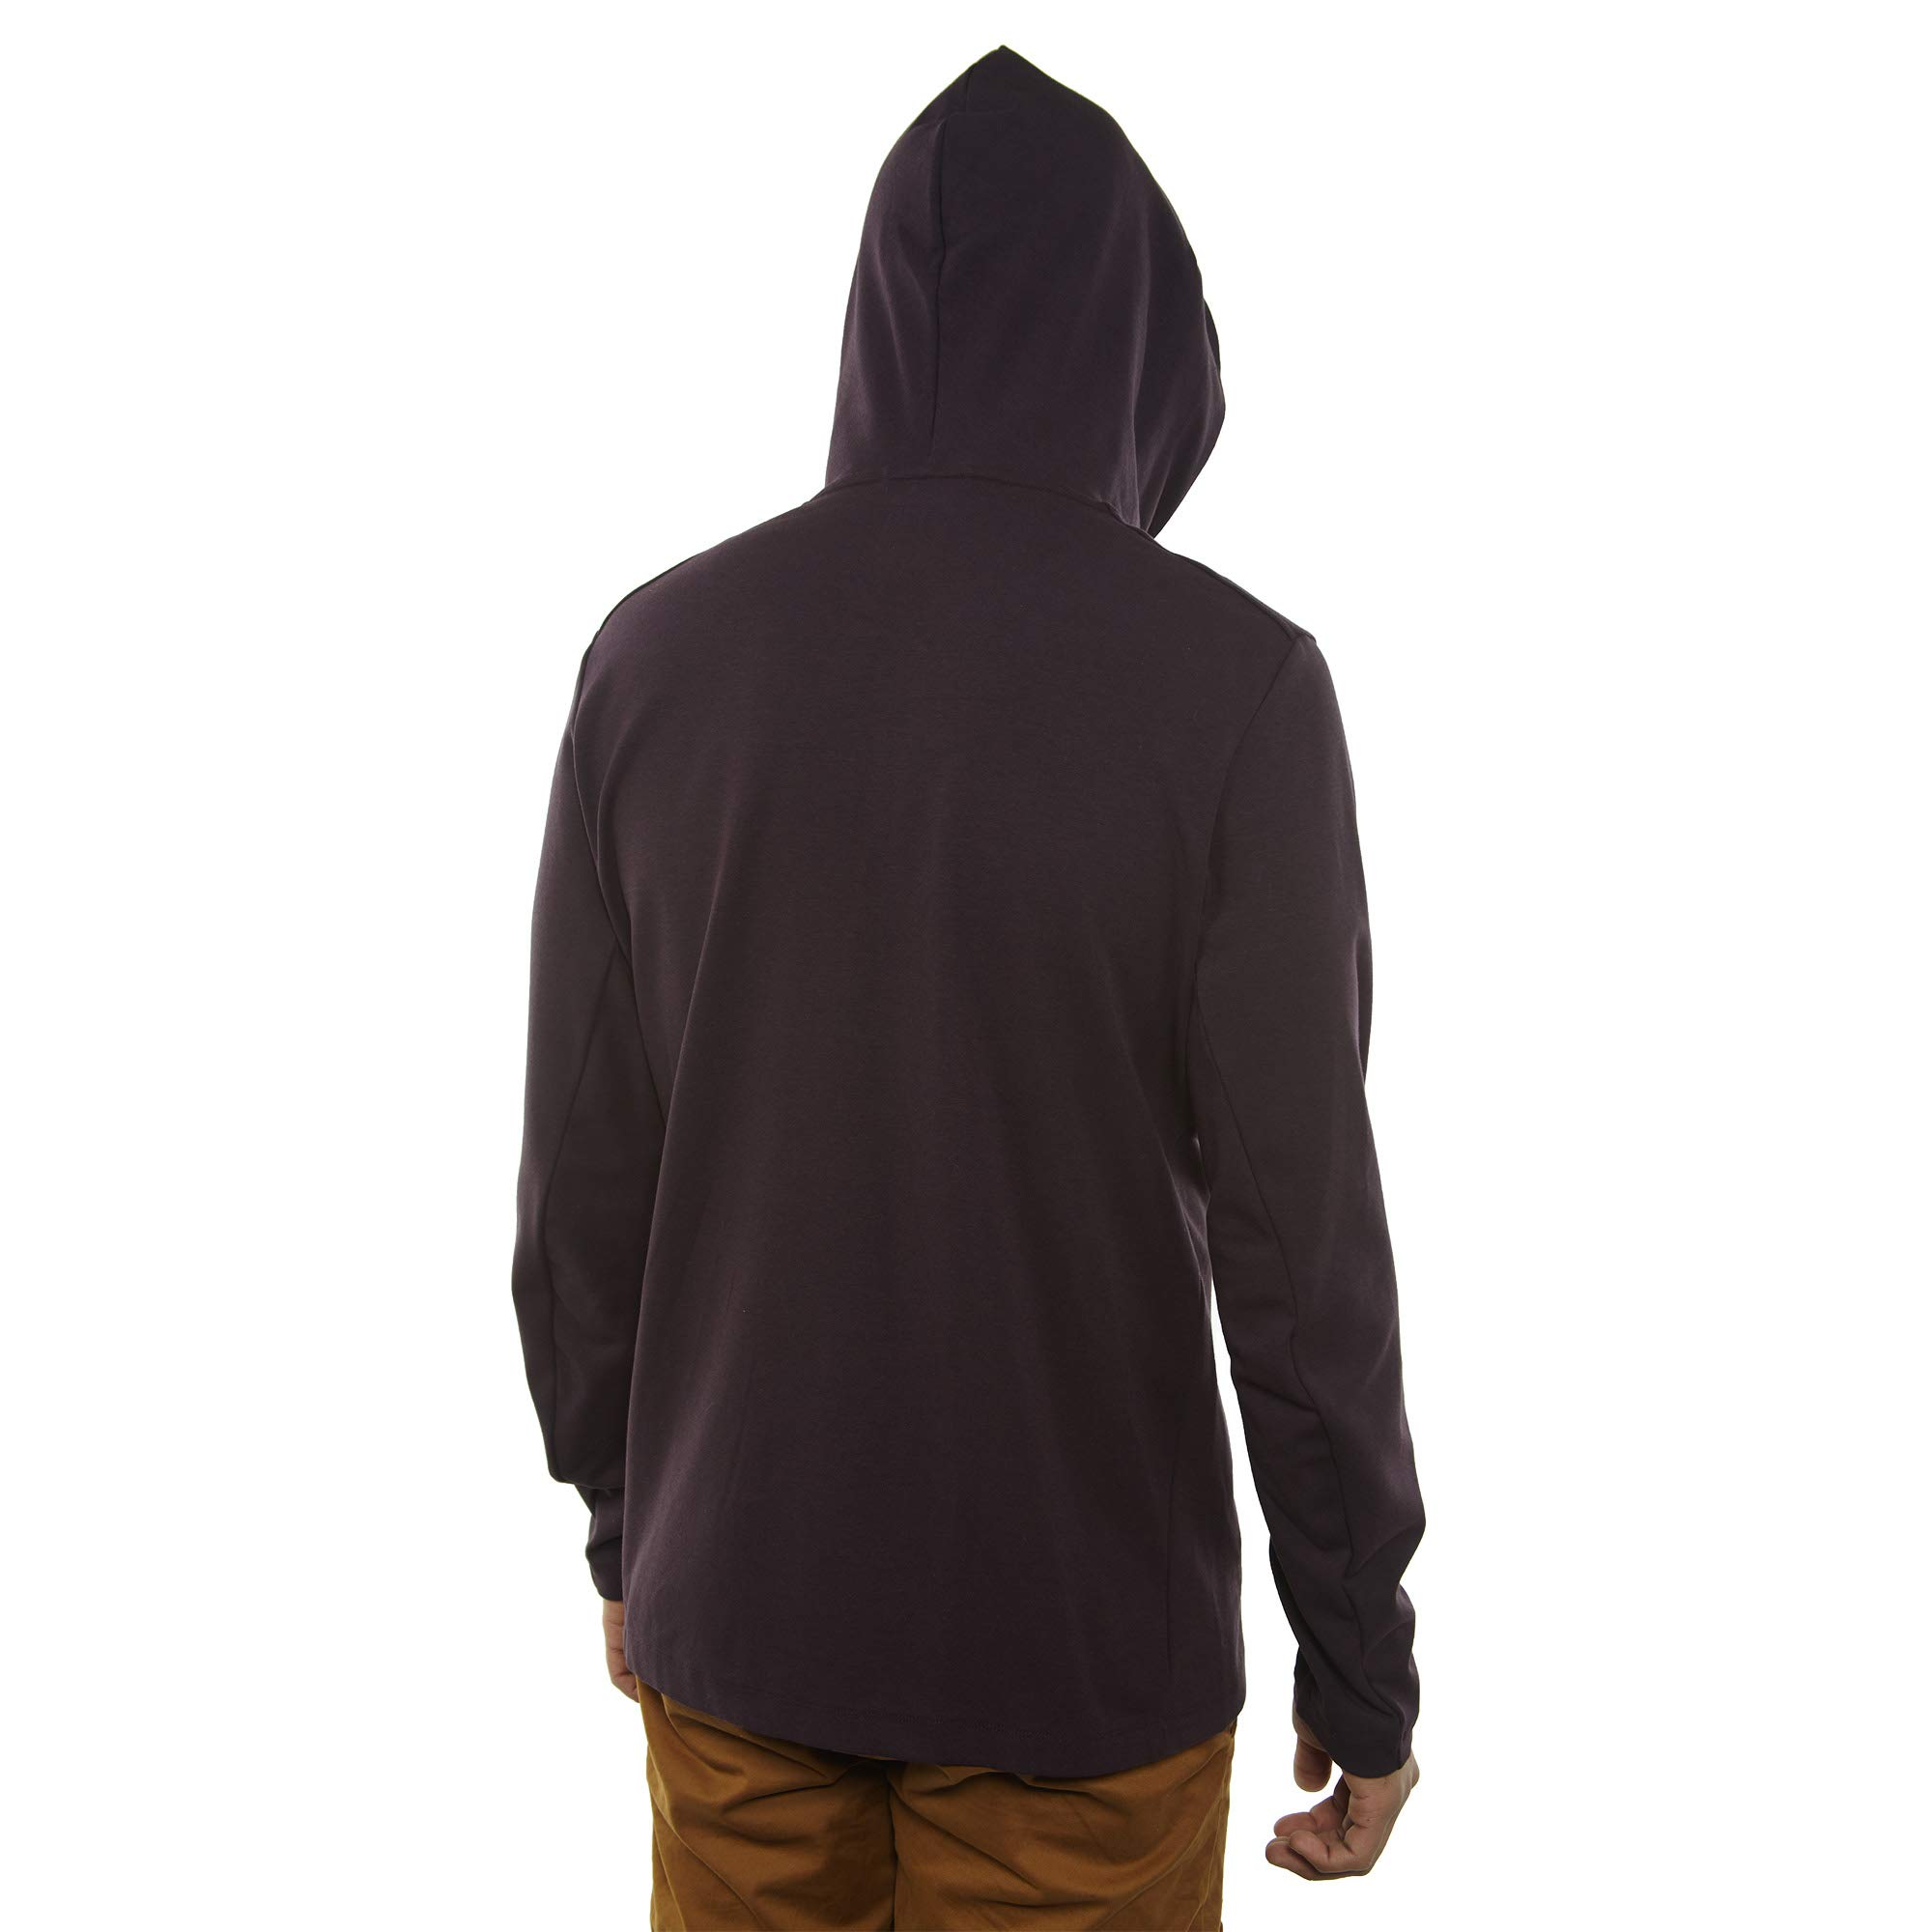 Nike Mens Tech Fleece Pack Full Zip Training Hoodie Burgundy Ash/Black AA3784-659 Size Small by Nike (Image #4)